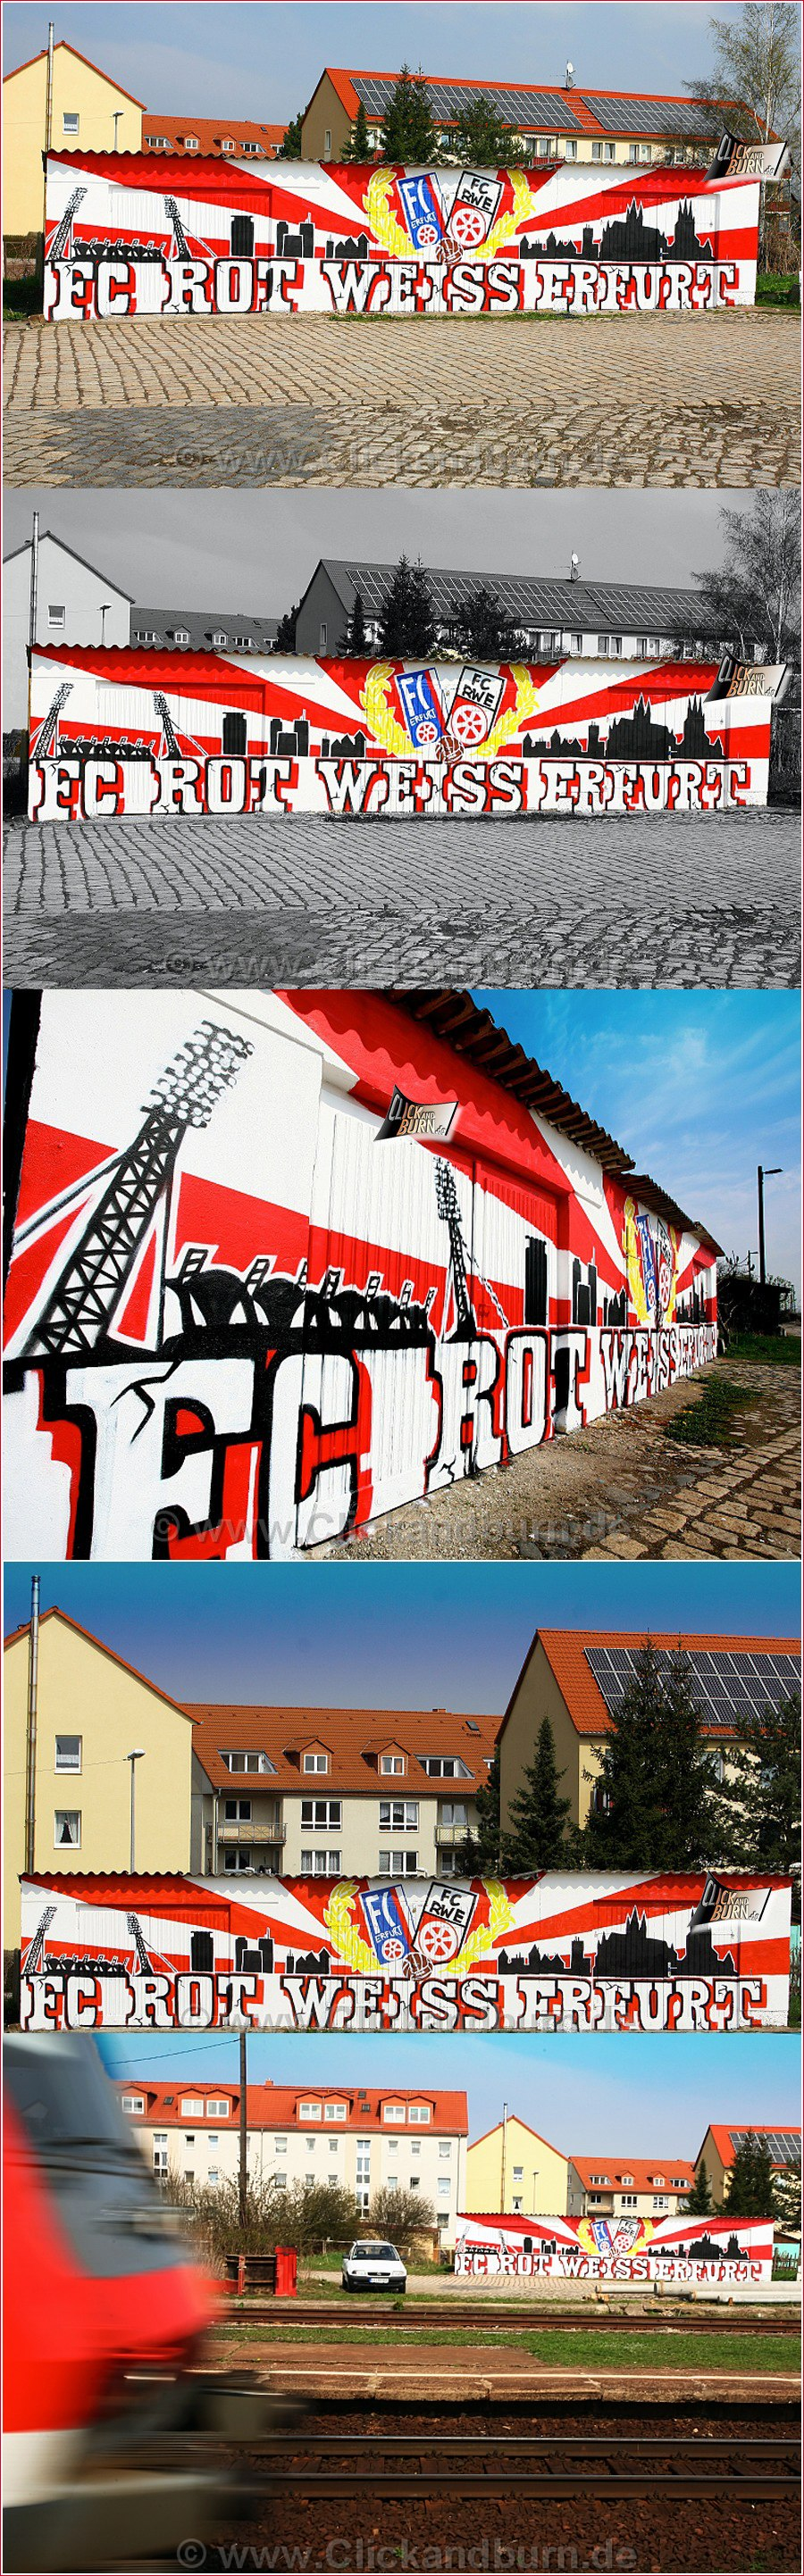 [Bild: Graffitti.jpg]